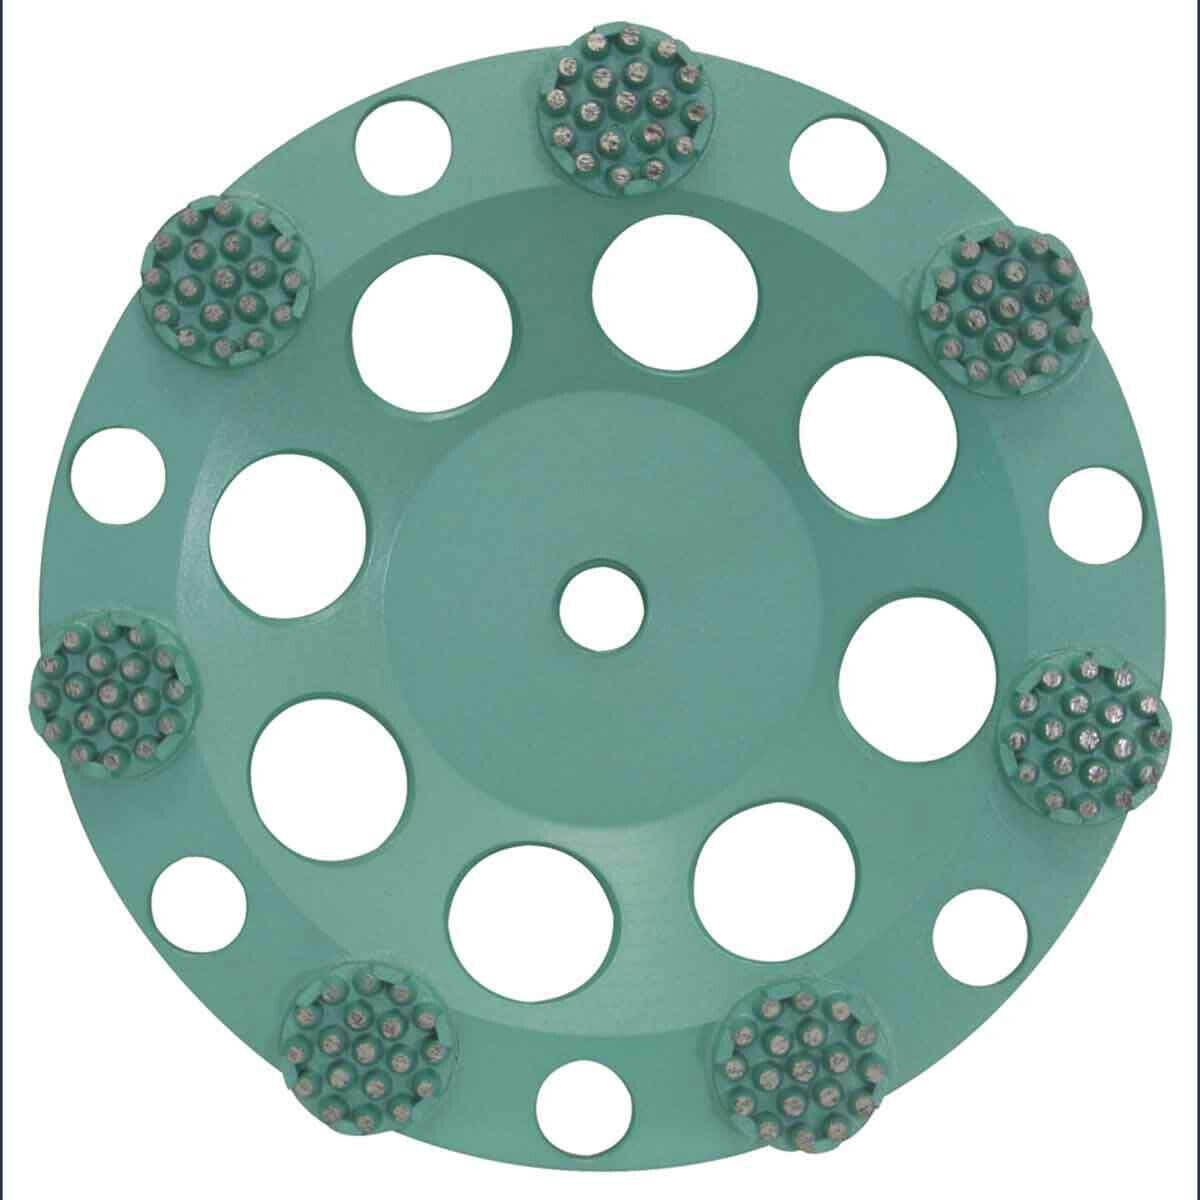 Pearl P4 7 inch Concrete & Natural Stone Button Cup Wheel